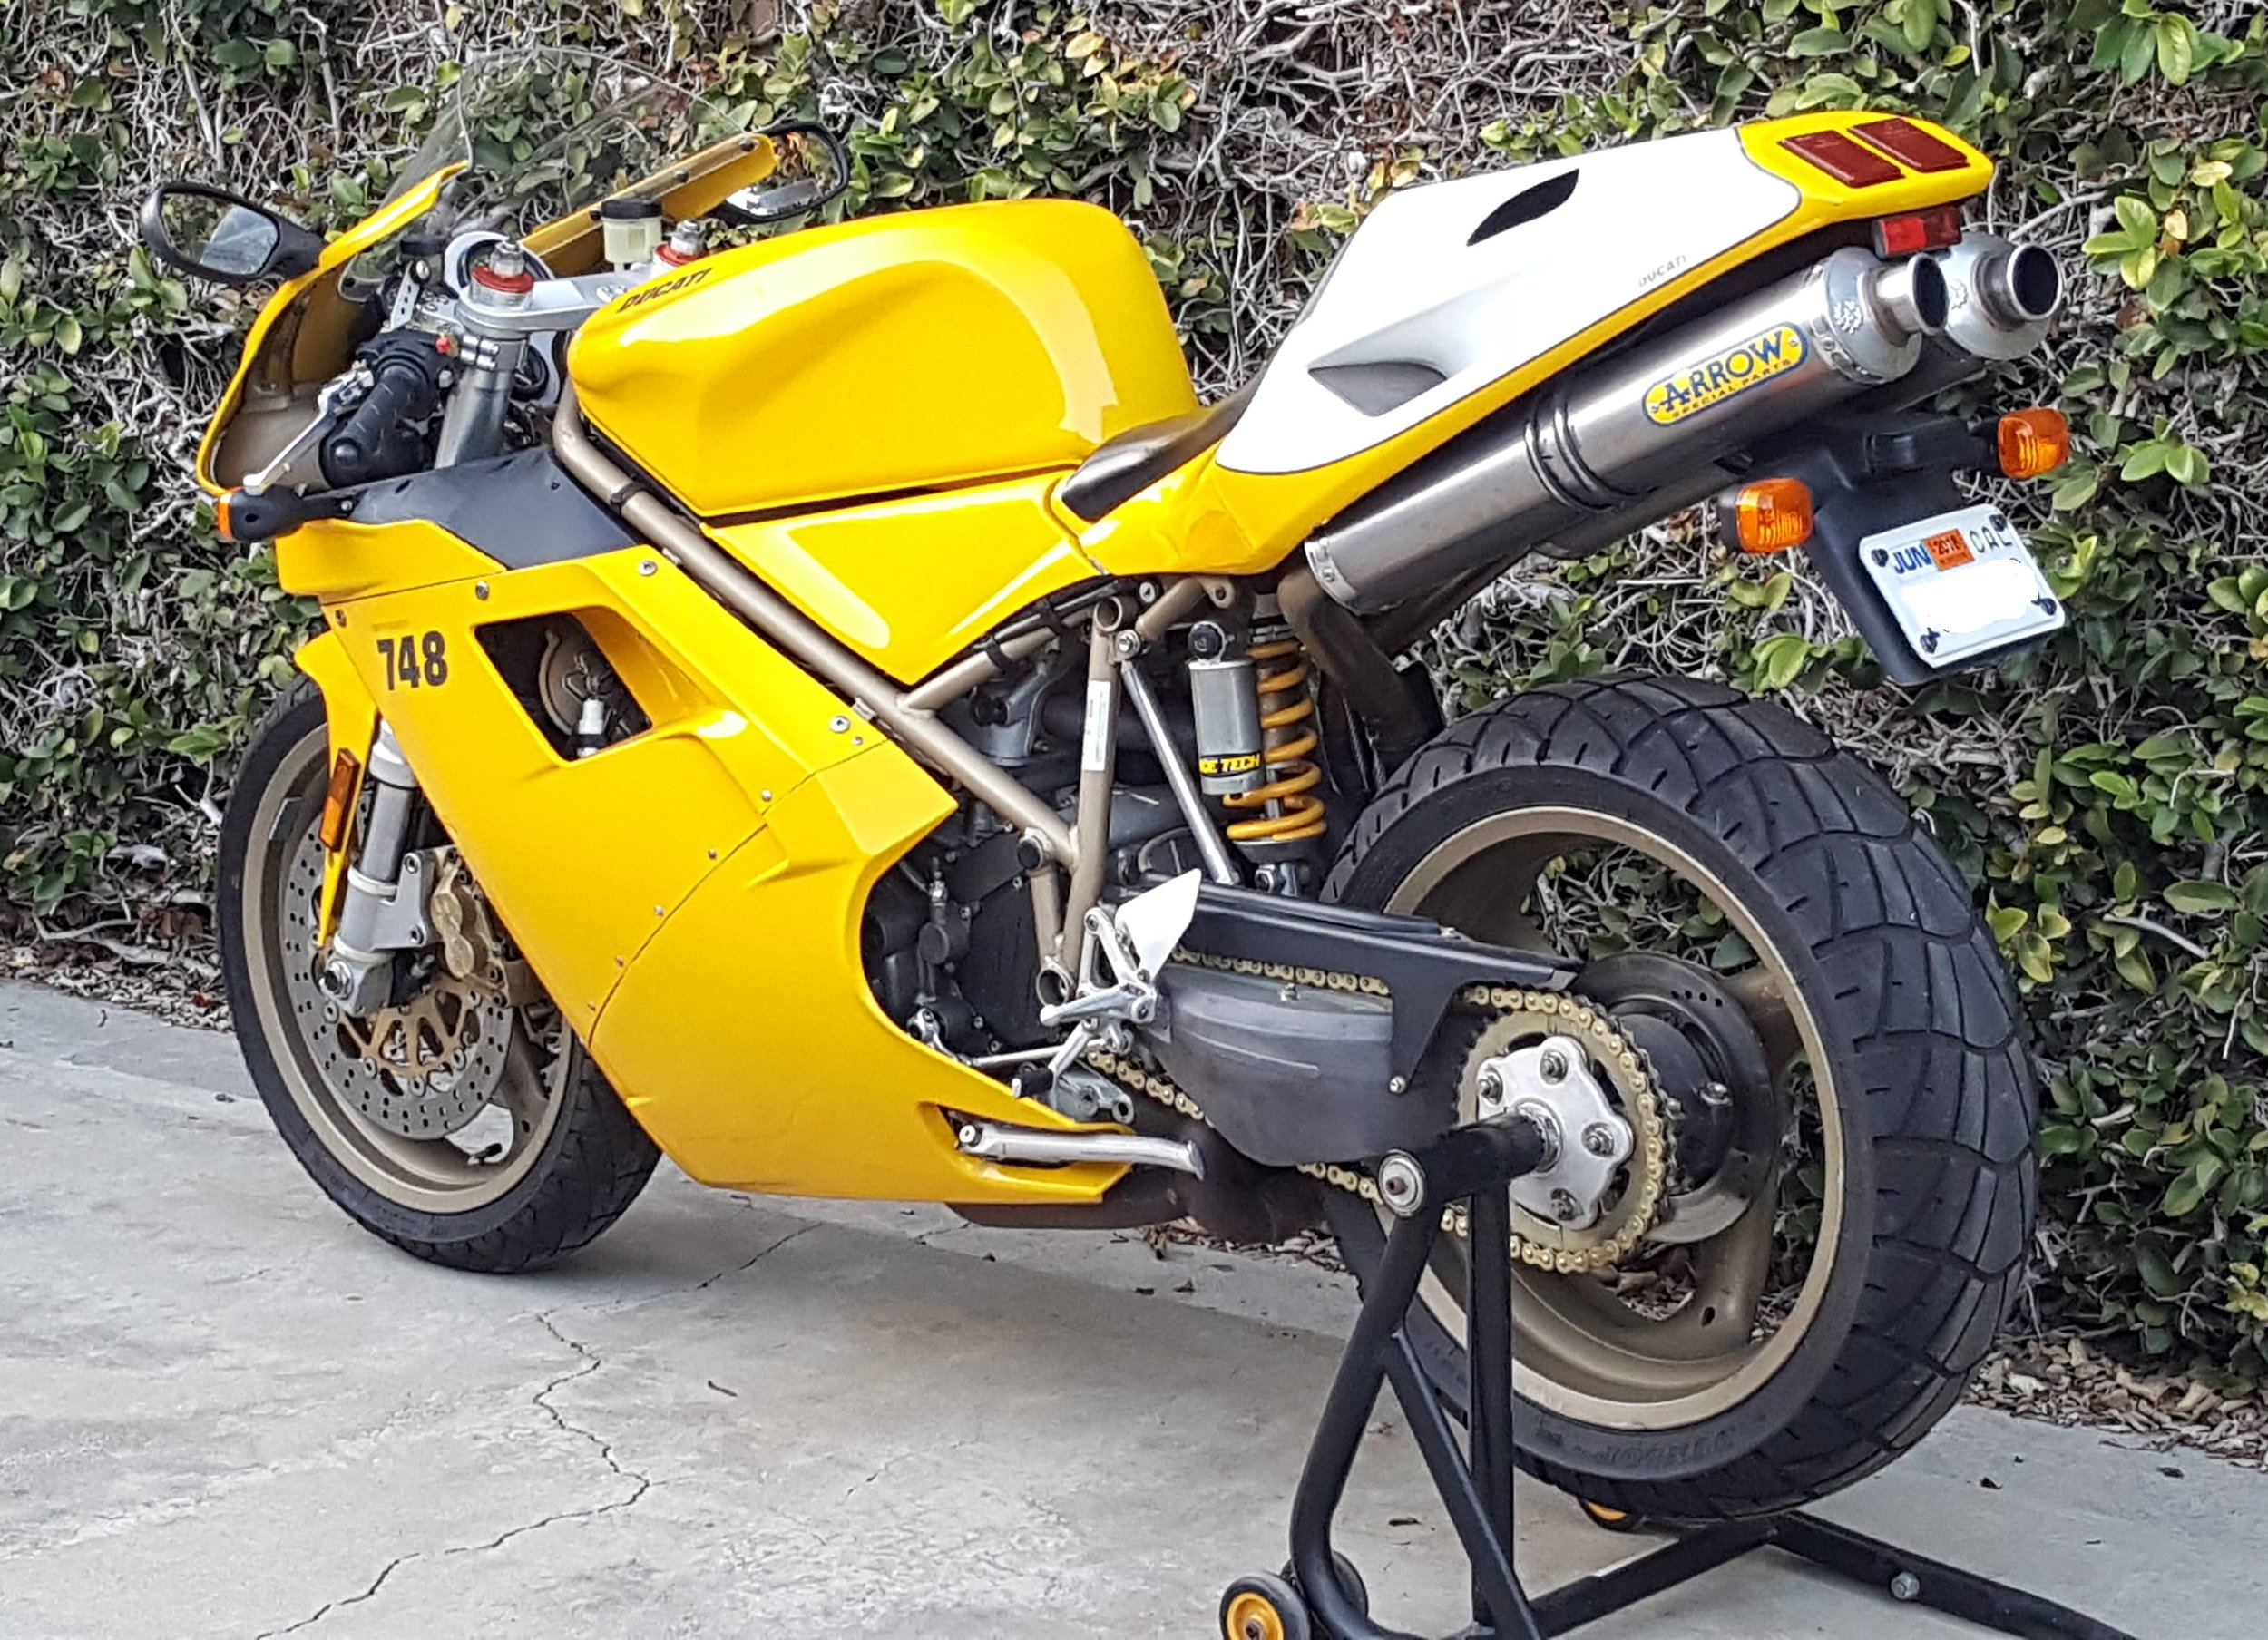 2000 Ducati 748-916 Restored5.jpg